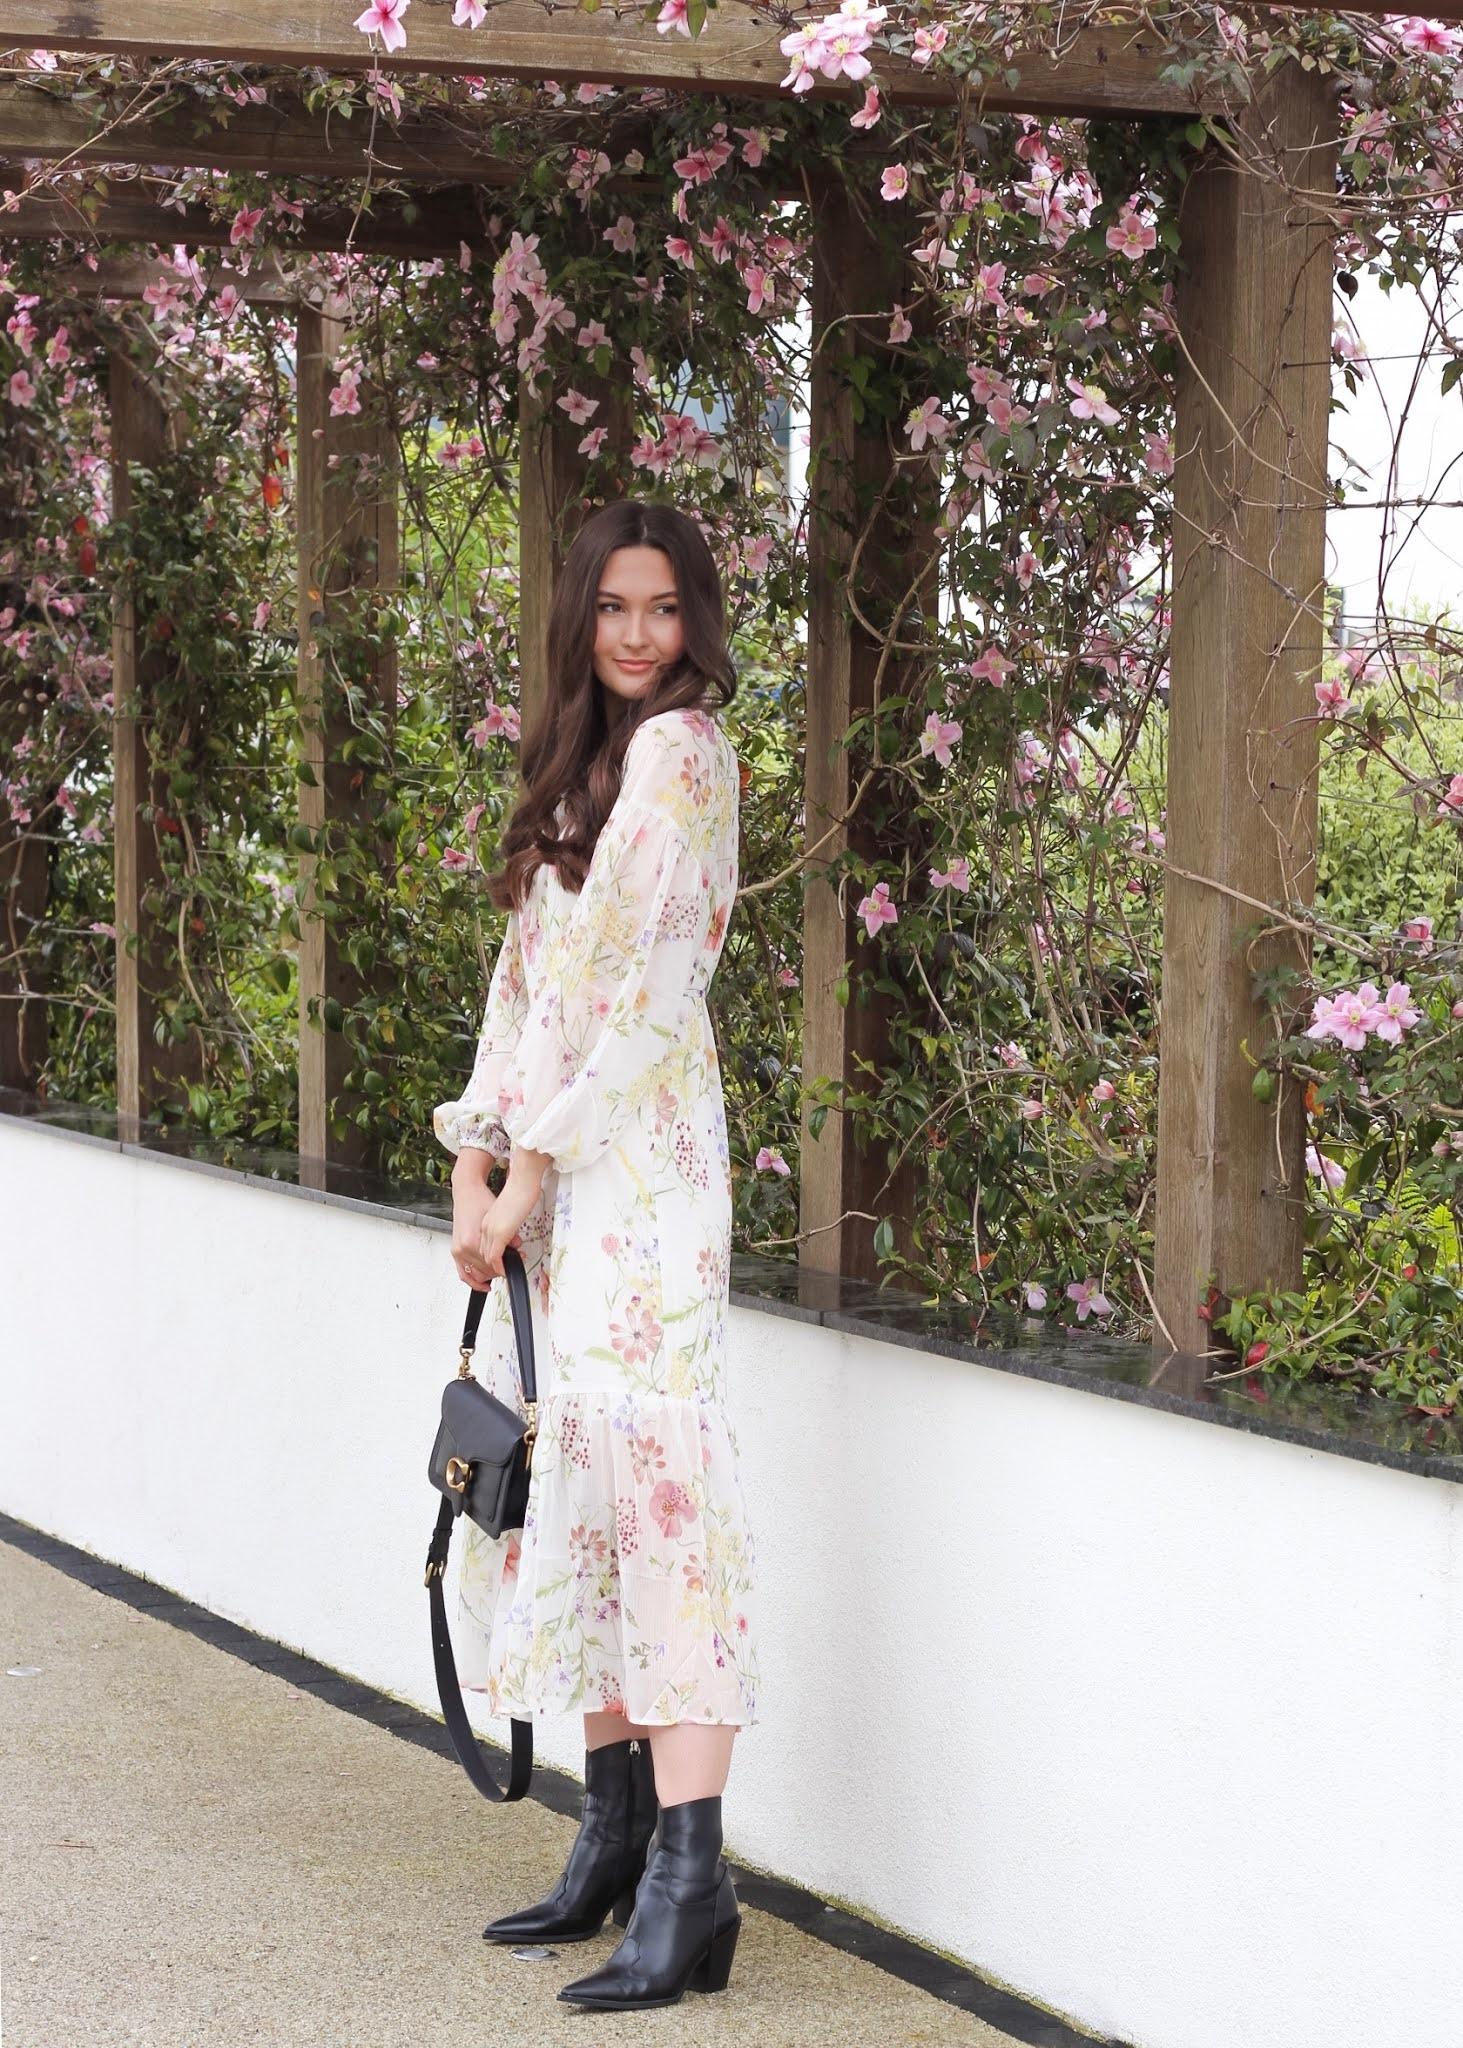 h&m wildflower dress